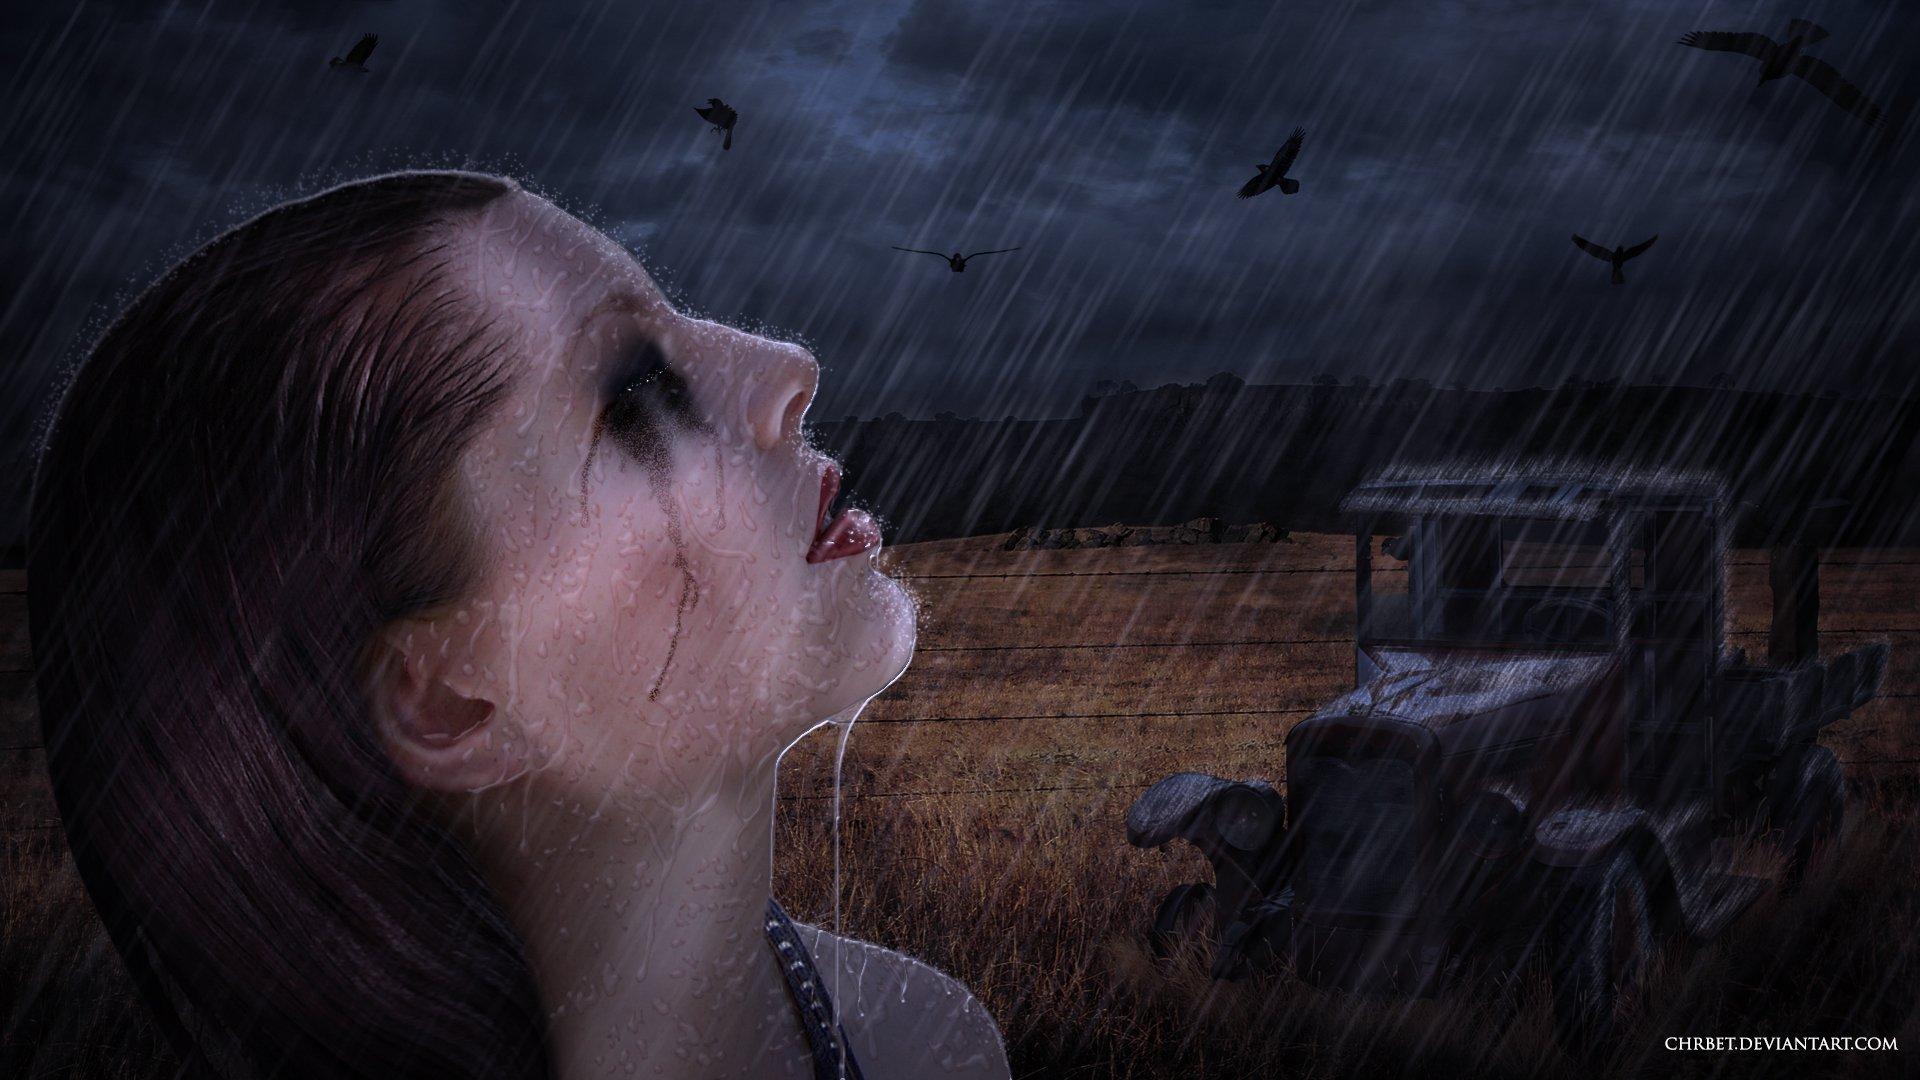 картинки на ночь глядя со слезами бог